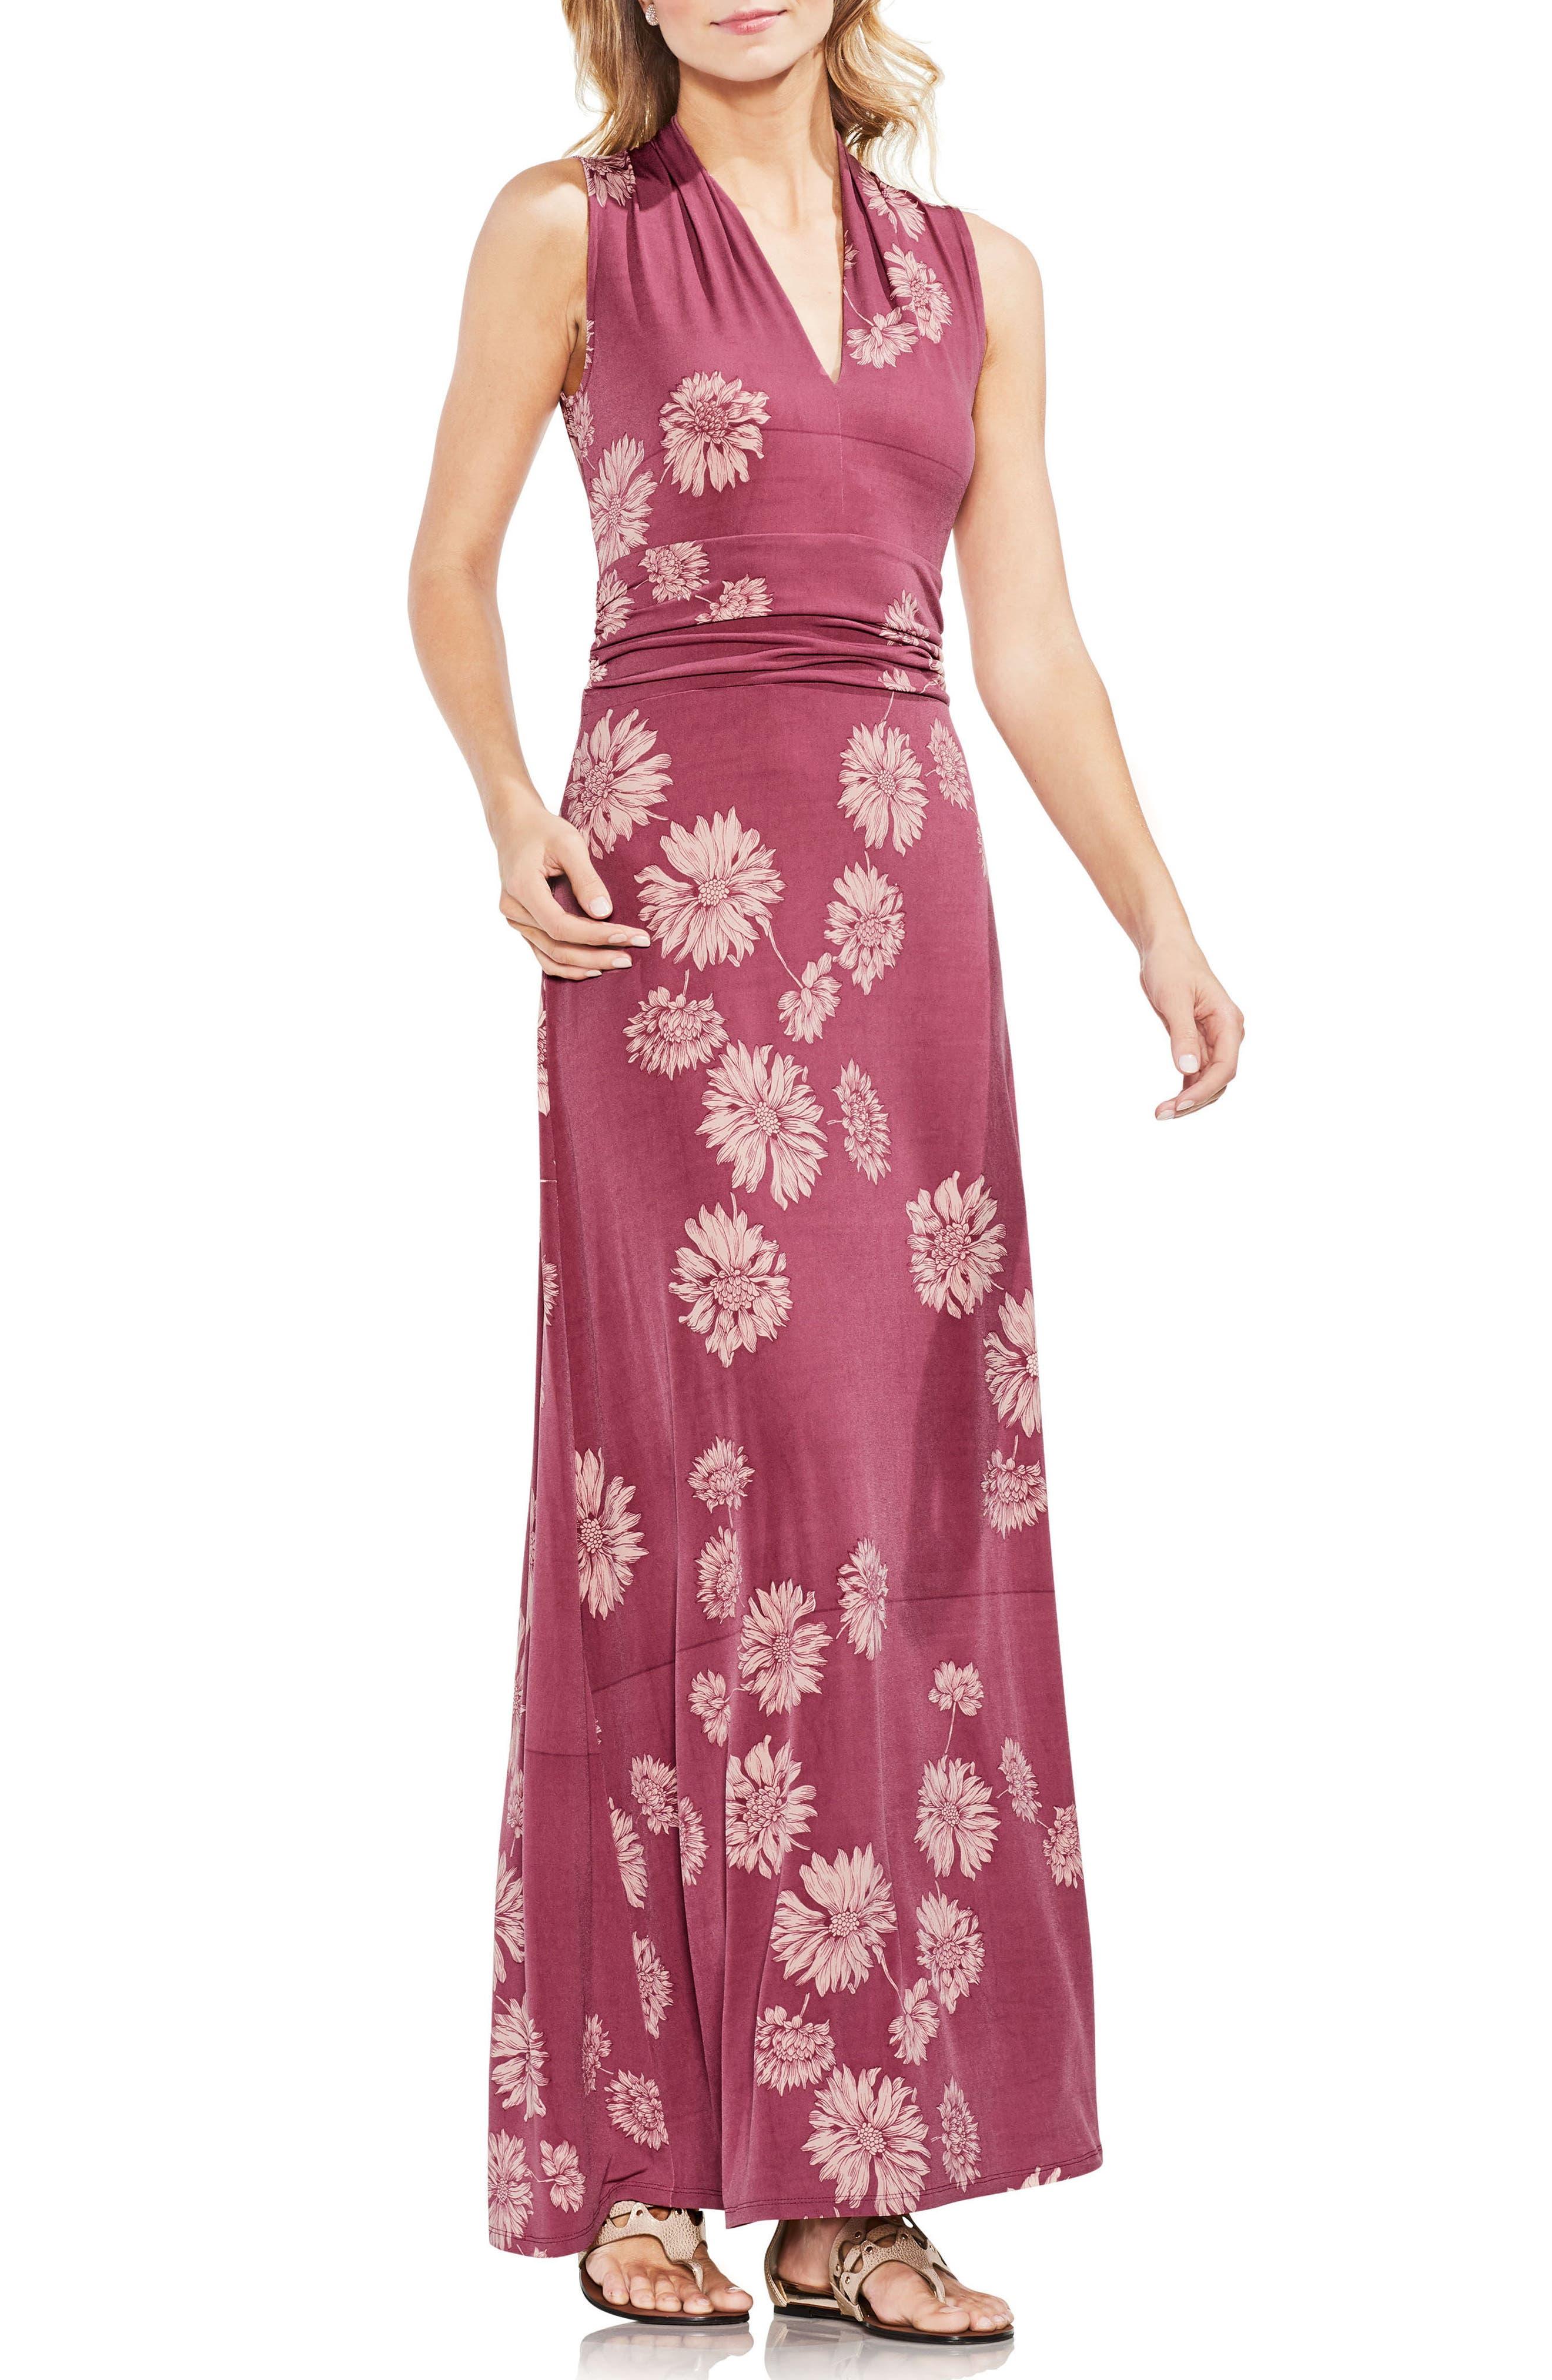 Chateau Floral Halter Maxi Dress,                             Main thumbnail 2, color,